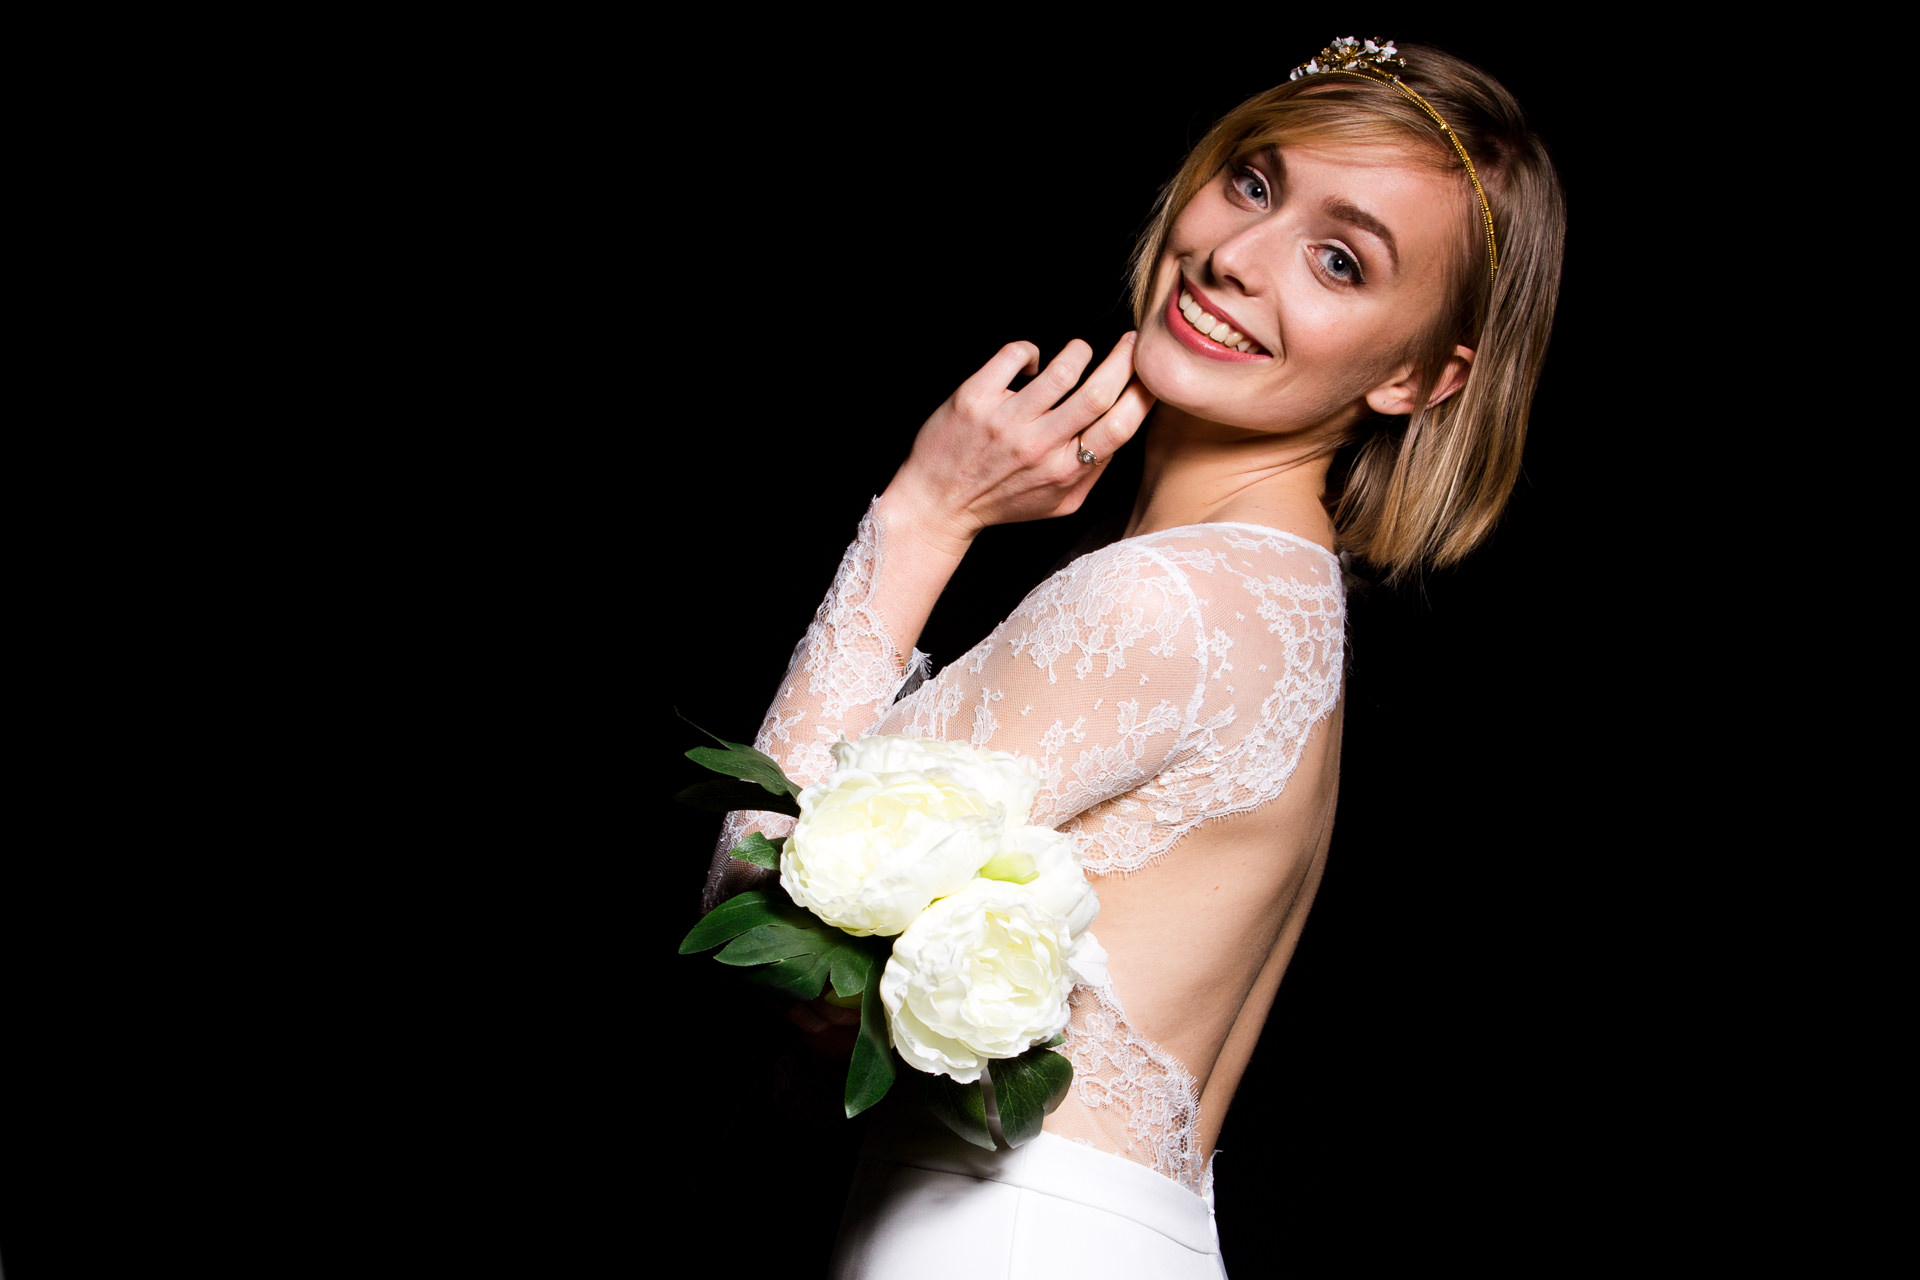 Splendide wedding photographe mariage val de marne benoit et laura-7